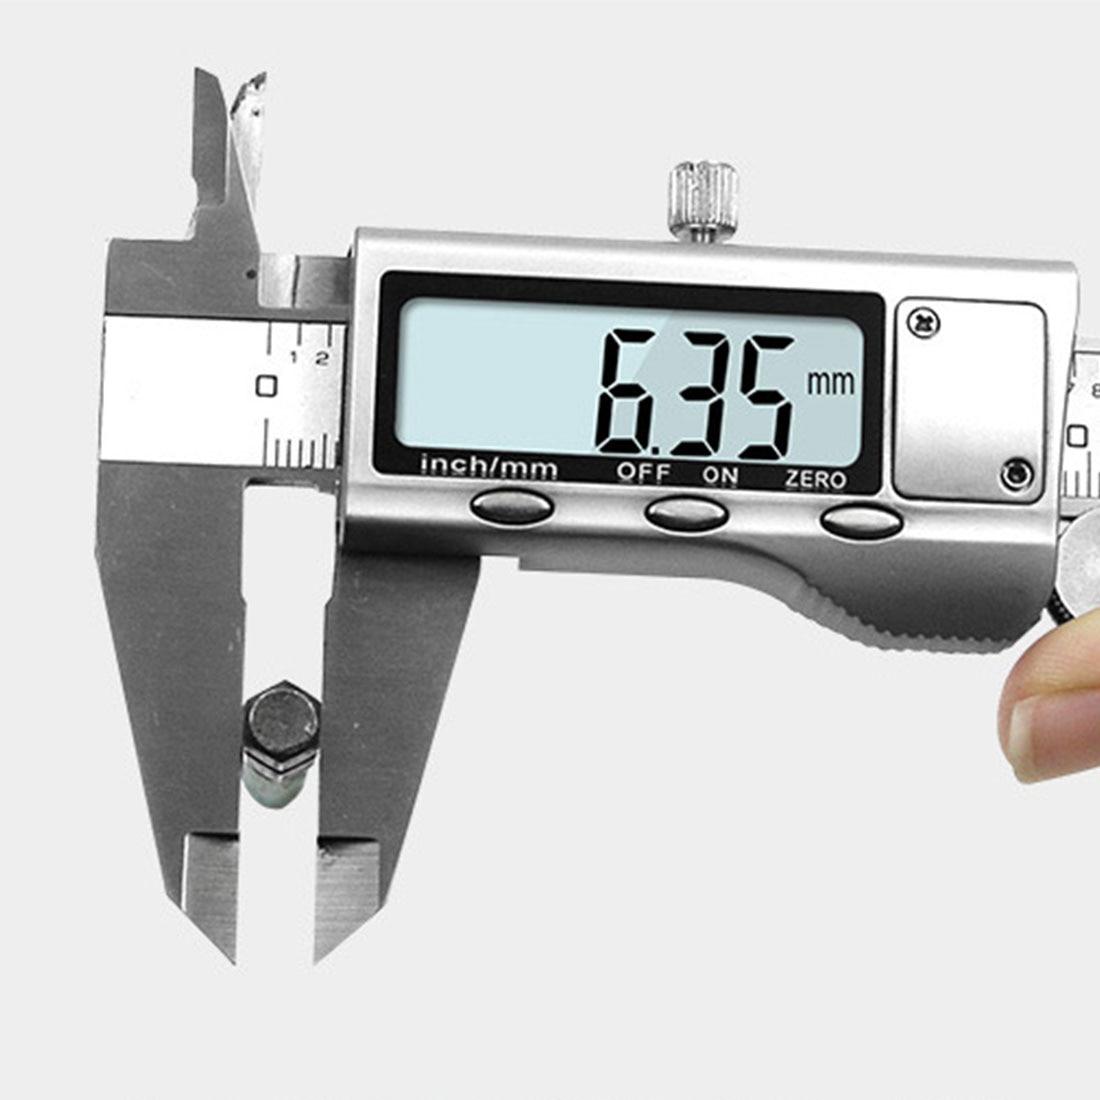 Magnetic Anti Slip Electric Screwdriver Bit